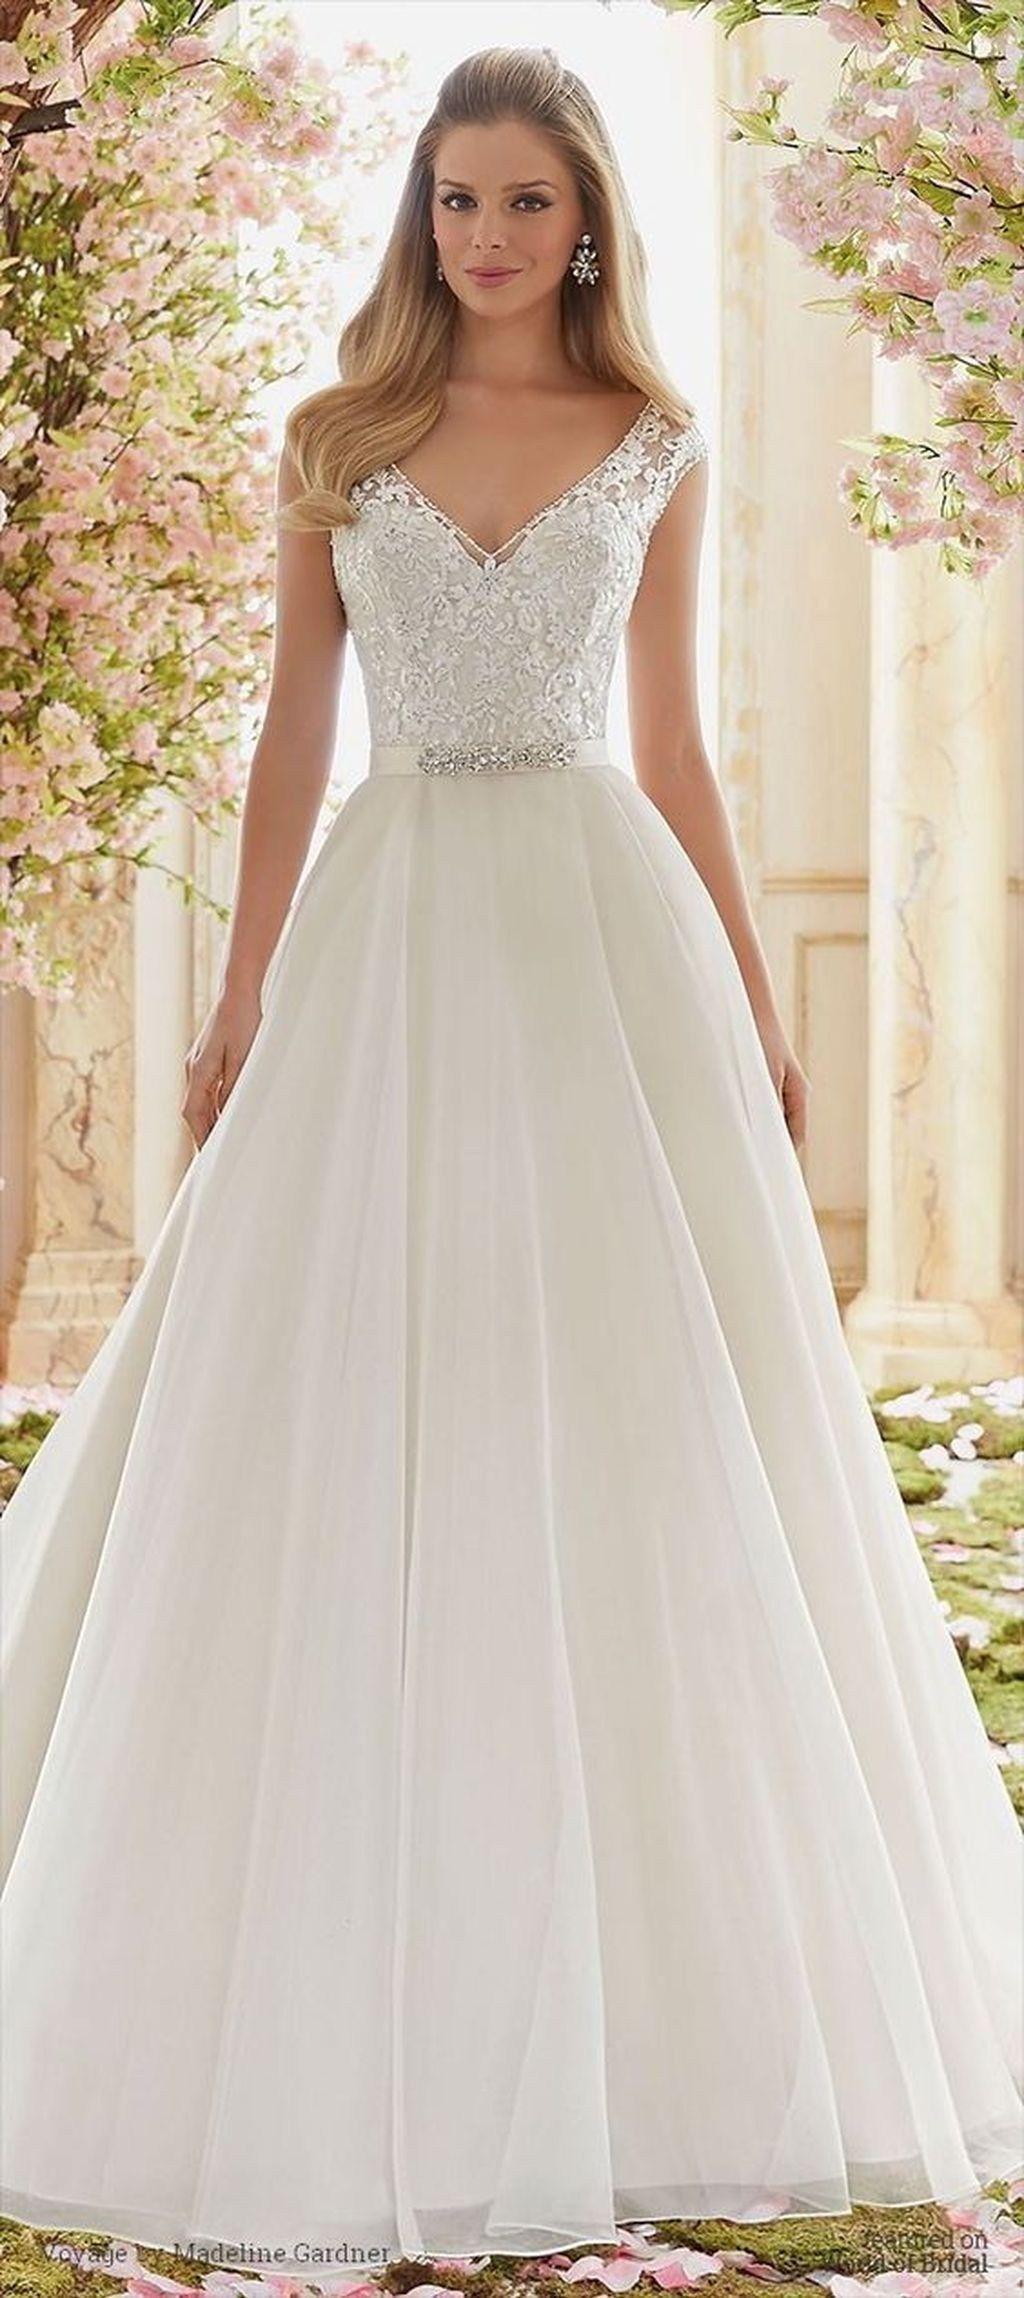 Pin By Lanie On Wedding In 2018 Pinterest Wedding Dresses